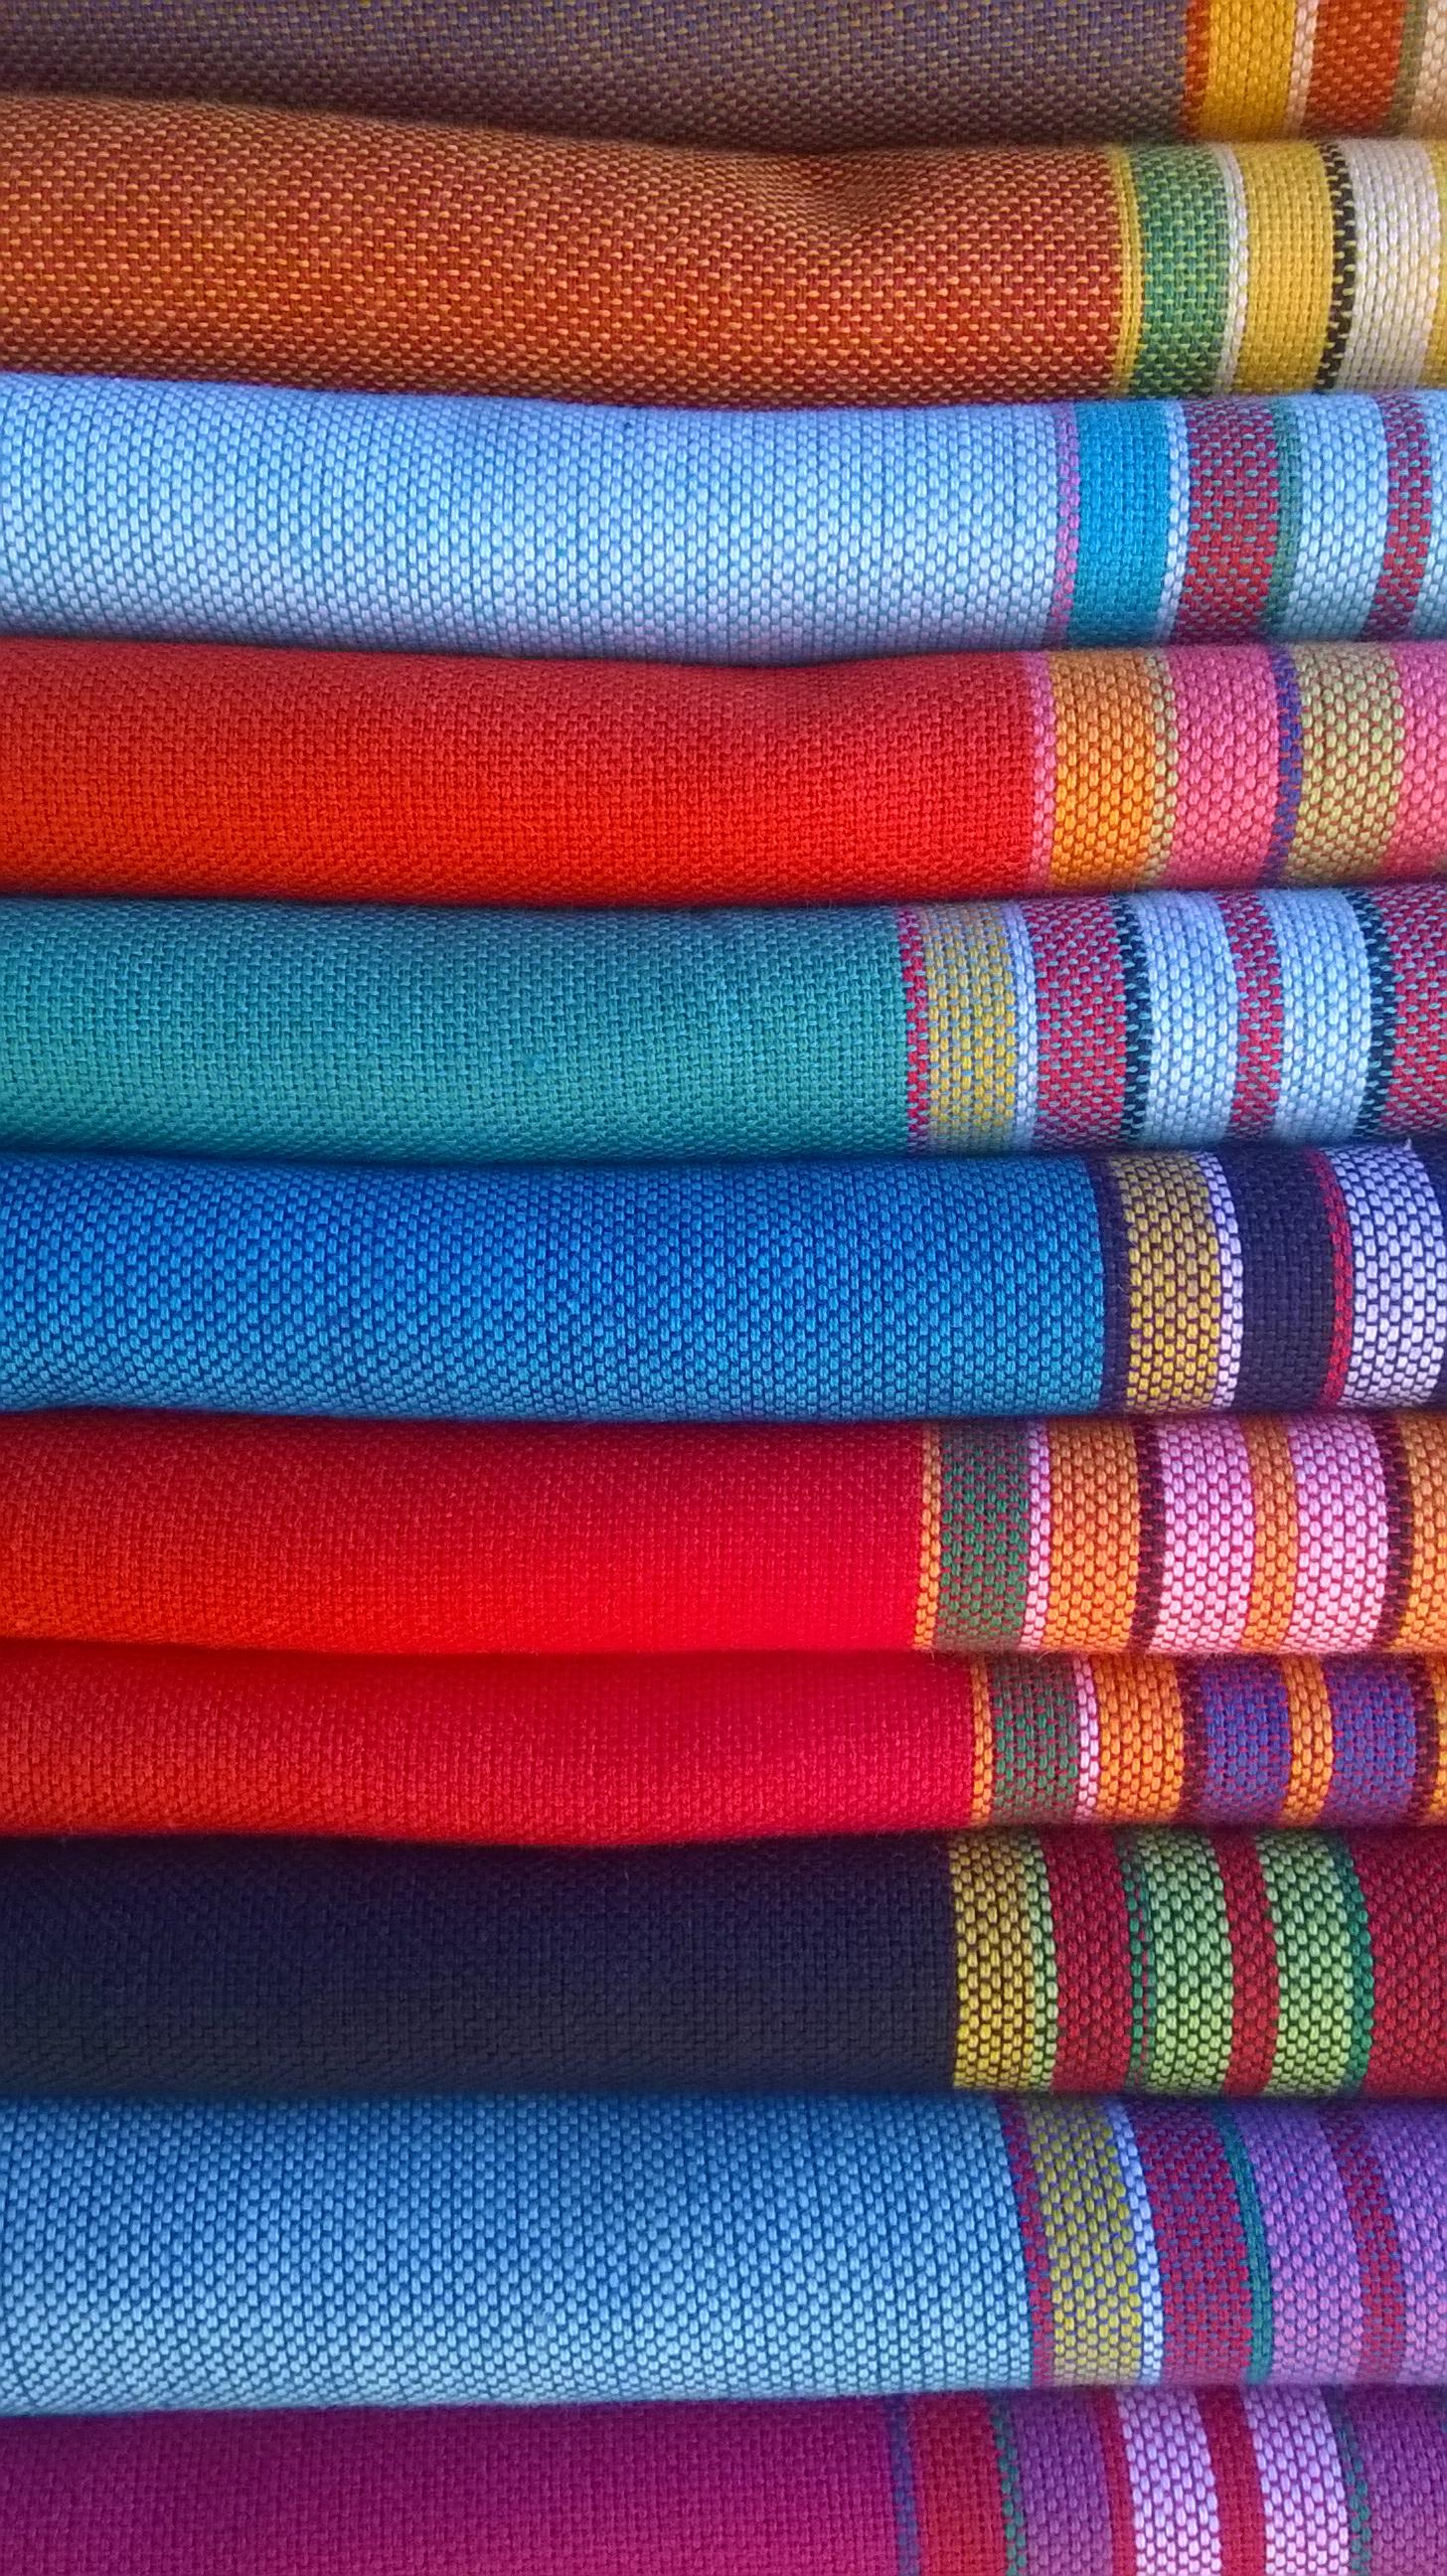 fabric kenya kikoy maasai market nairobi kikoi file wikipedia commons wikimedia description